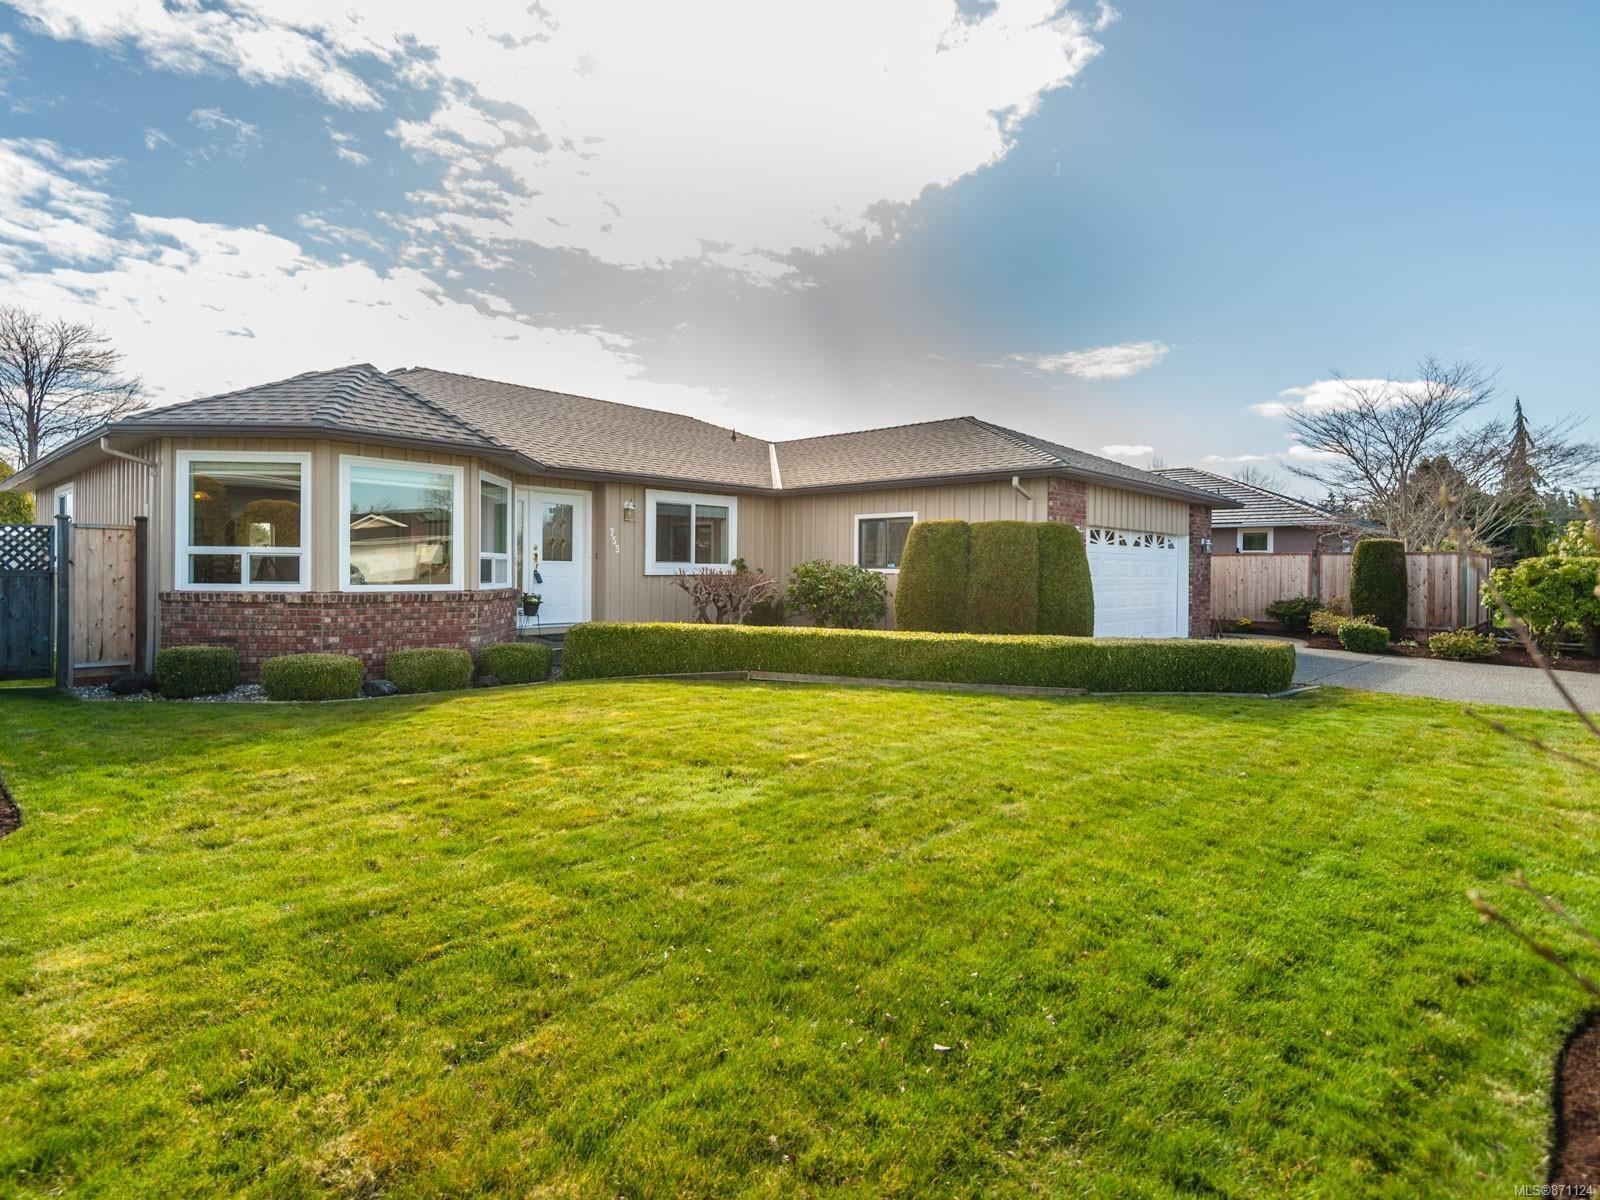 Main Photo: 753 Chartwell Blvd in : PQ Qualicum Beach House for sale (Parksville/Qualicum)  : MLS®# 871124